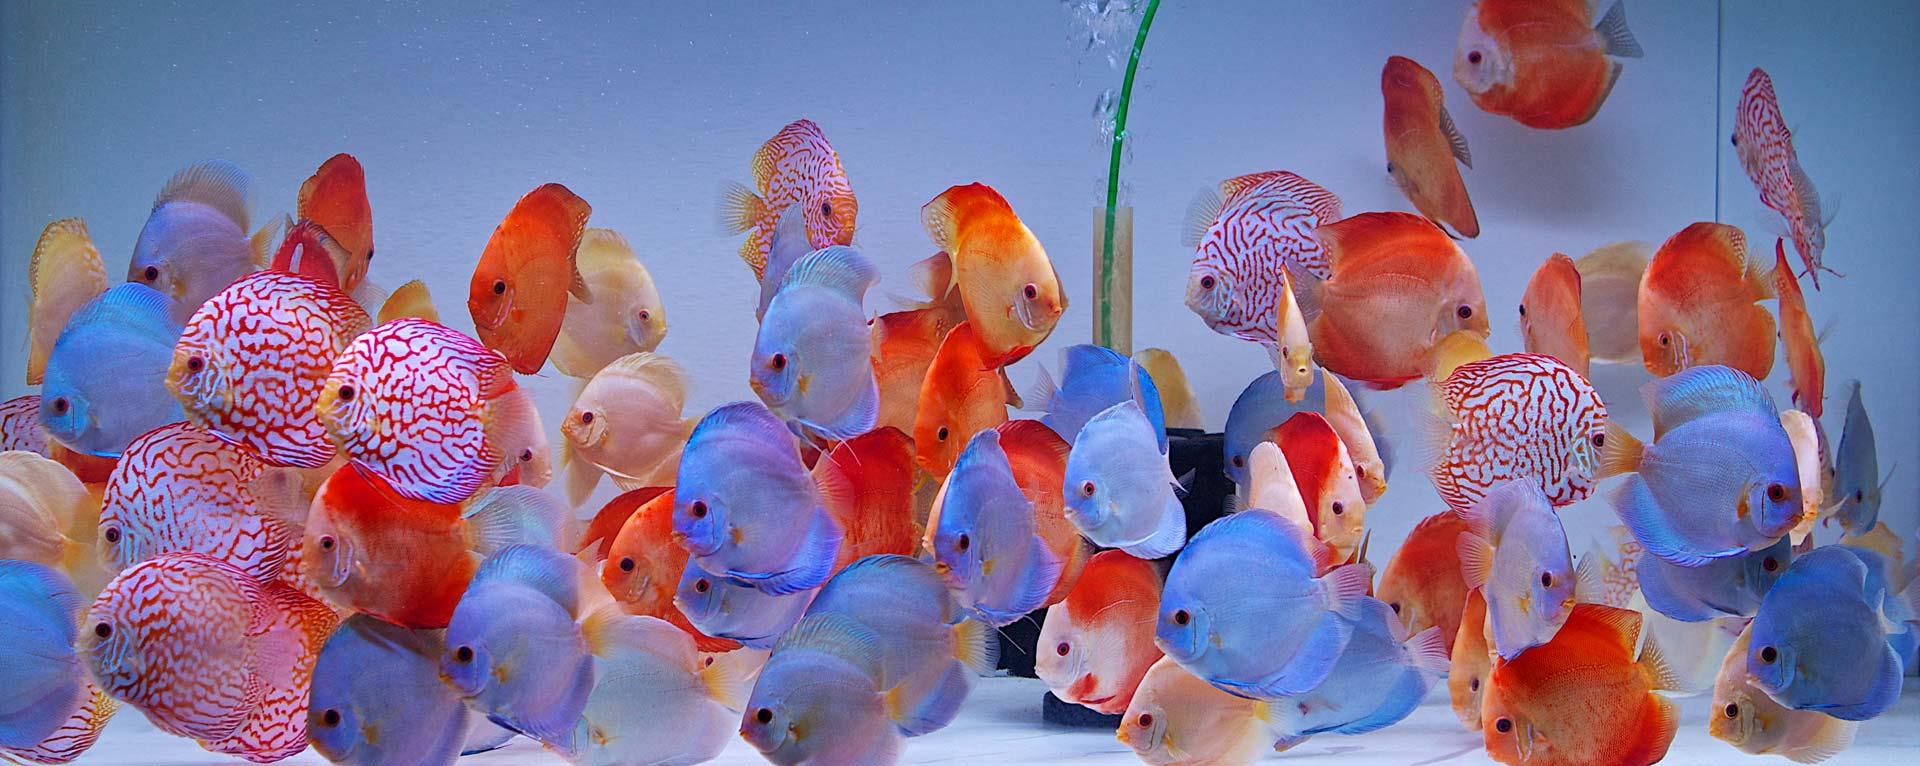 EuropaDiscusCenter Diskusfische